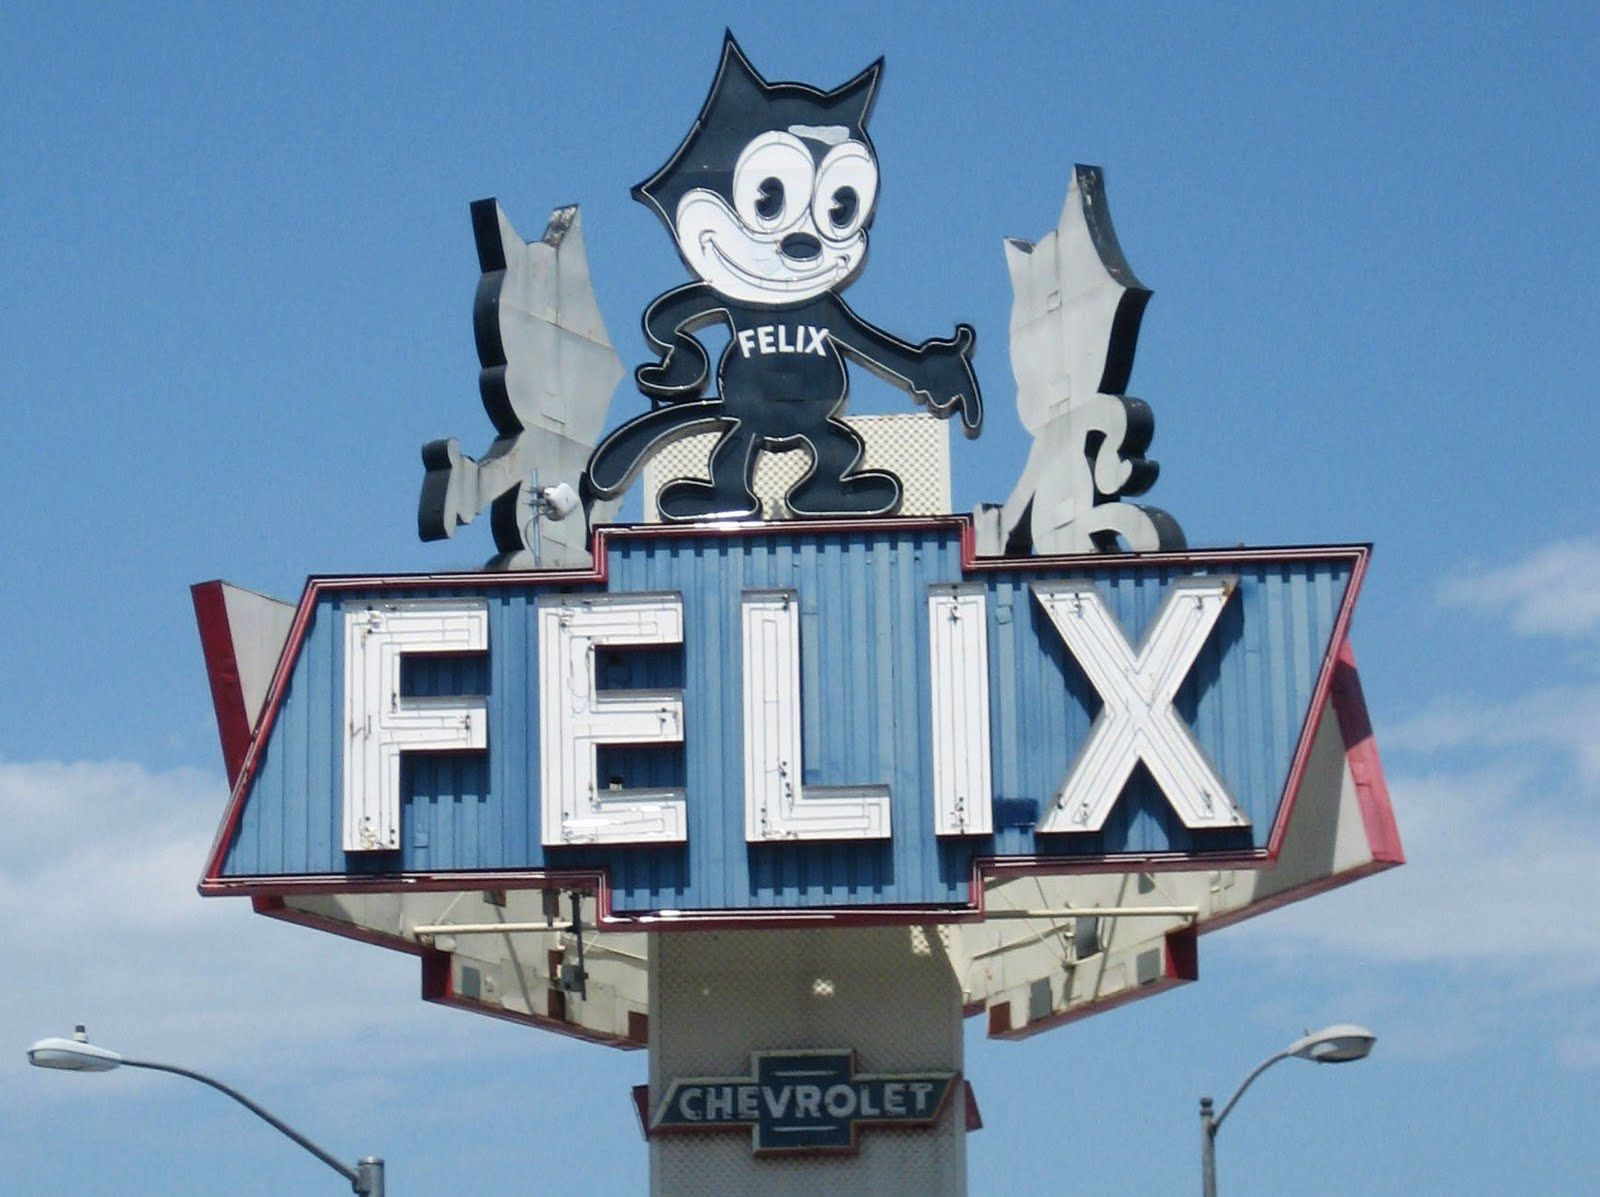 Wonderful Felix Chevrolet U2022 Los Angeles, California